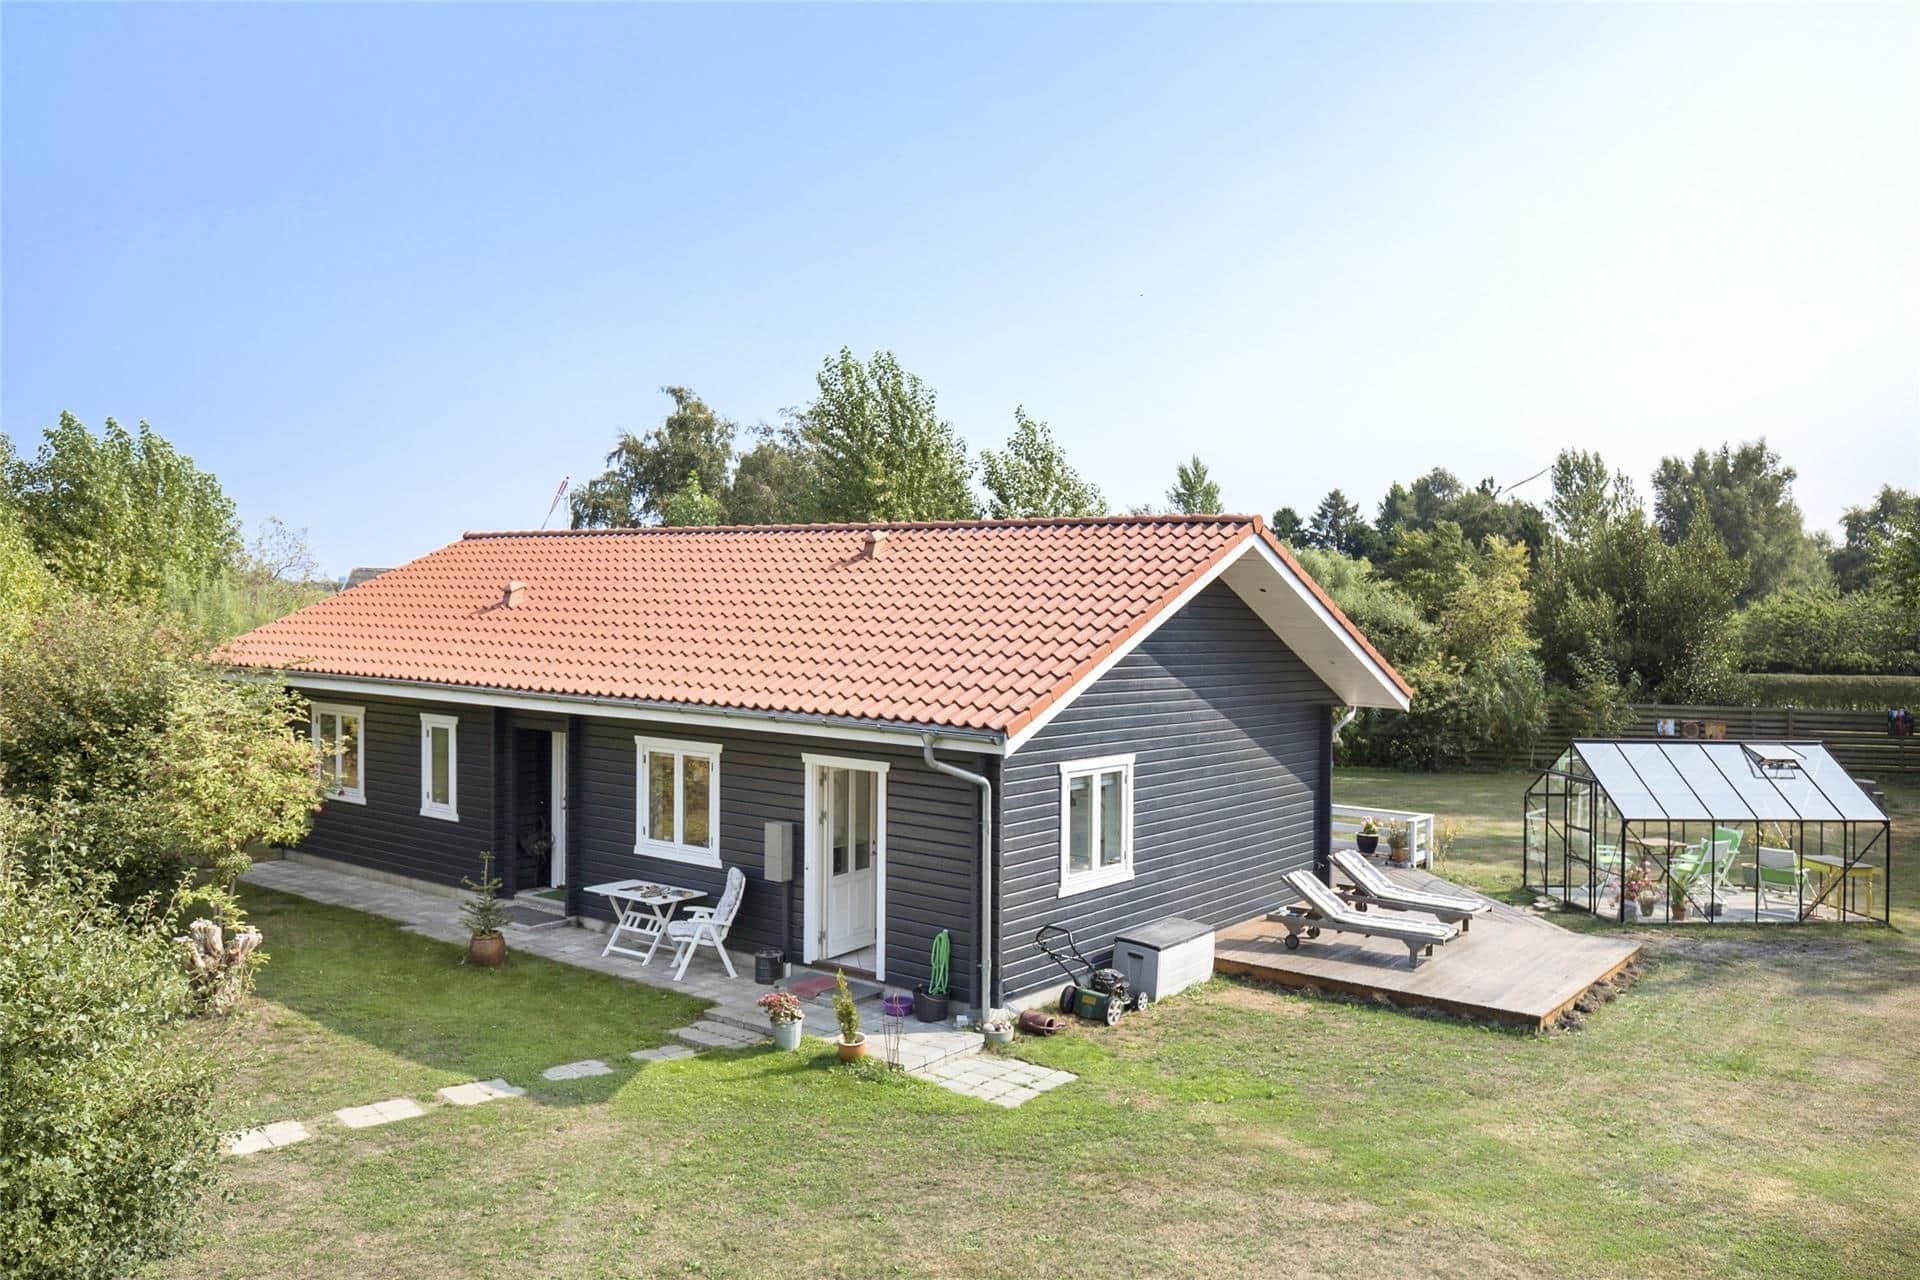 Image 1-17 Holiday-home 13390, Ellinge Skovvej 16, DK - 4573 Højby